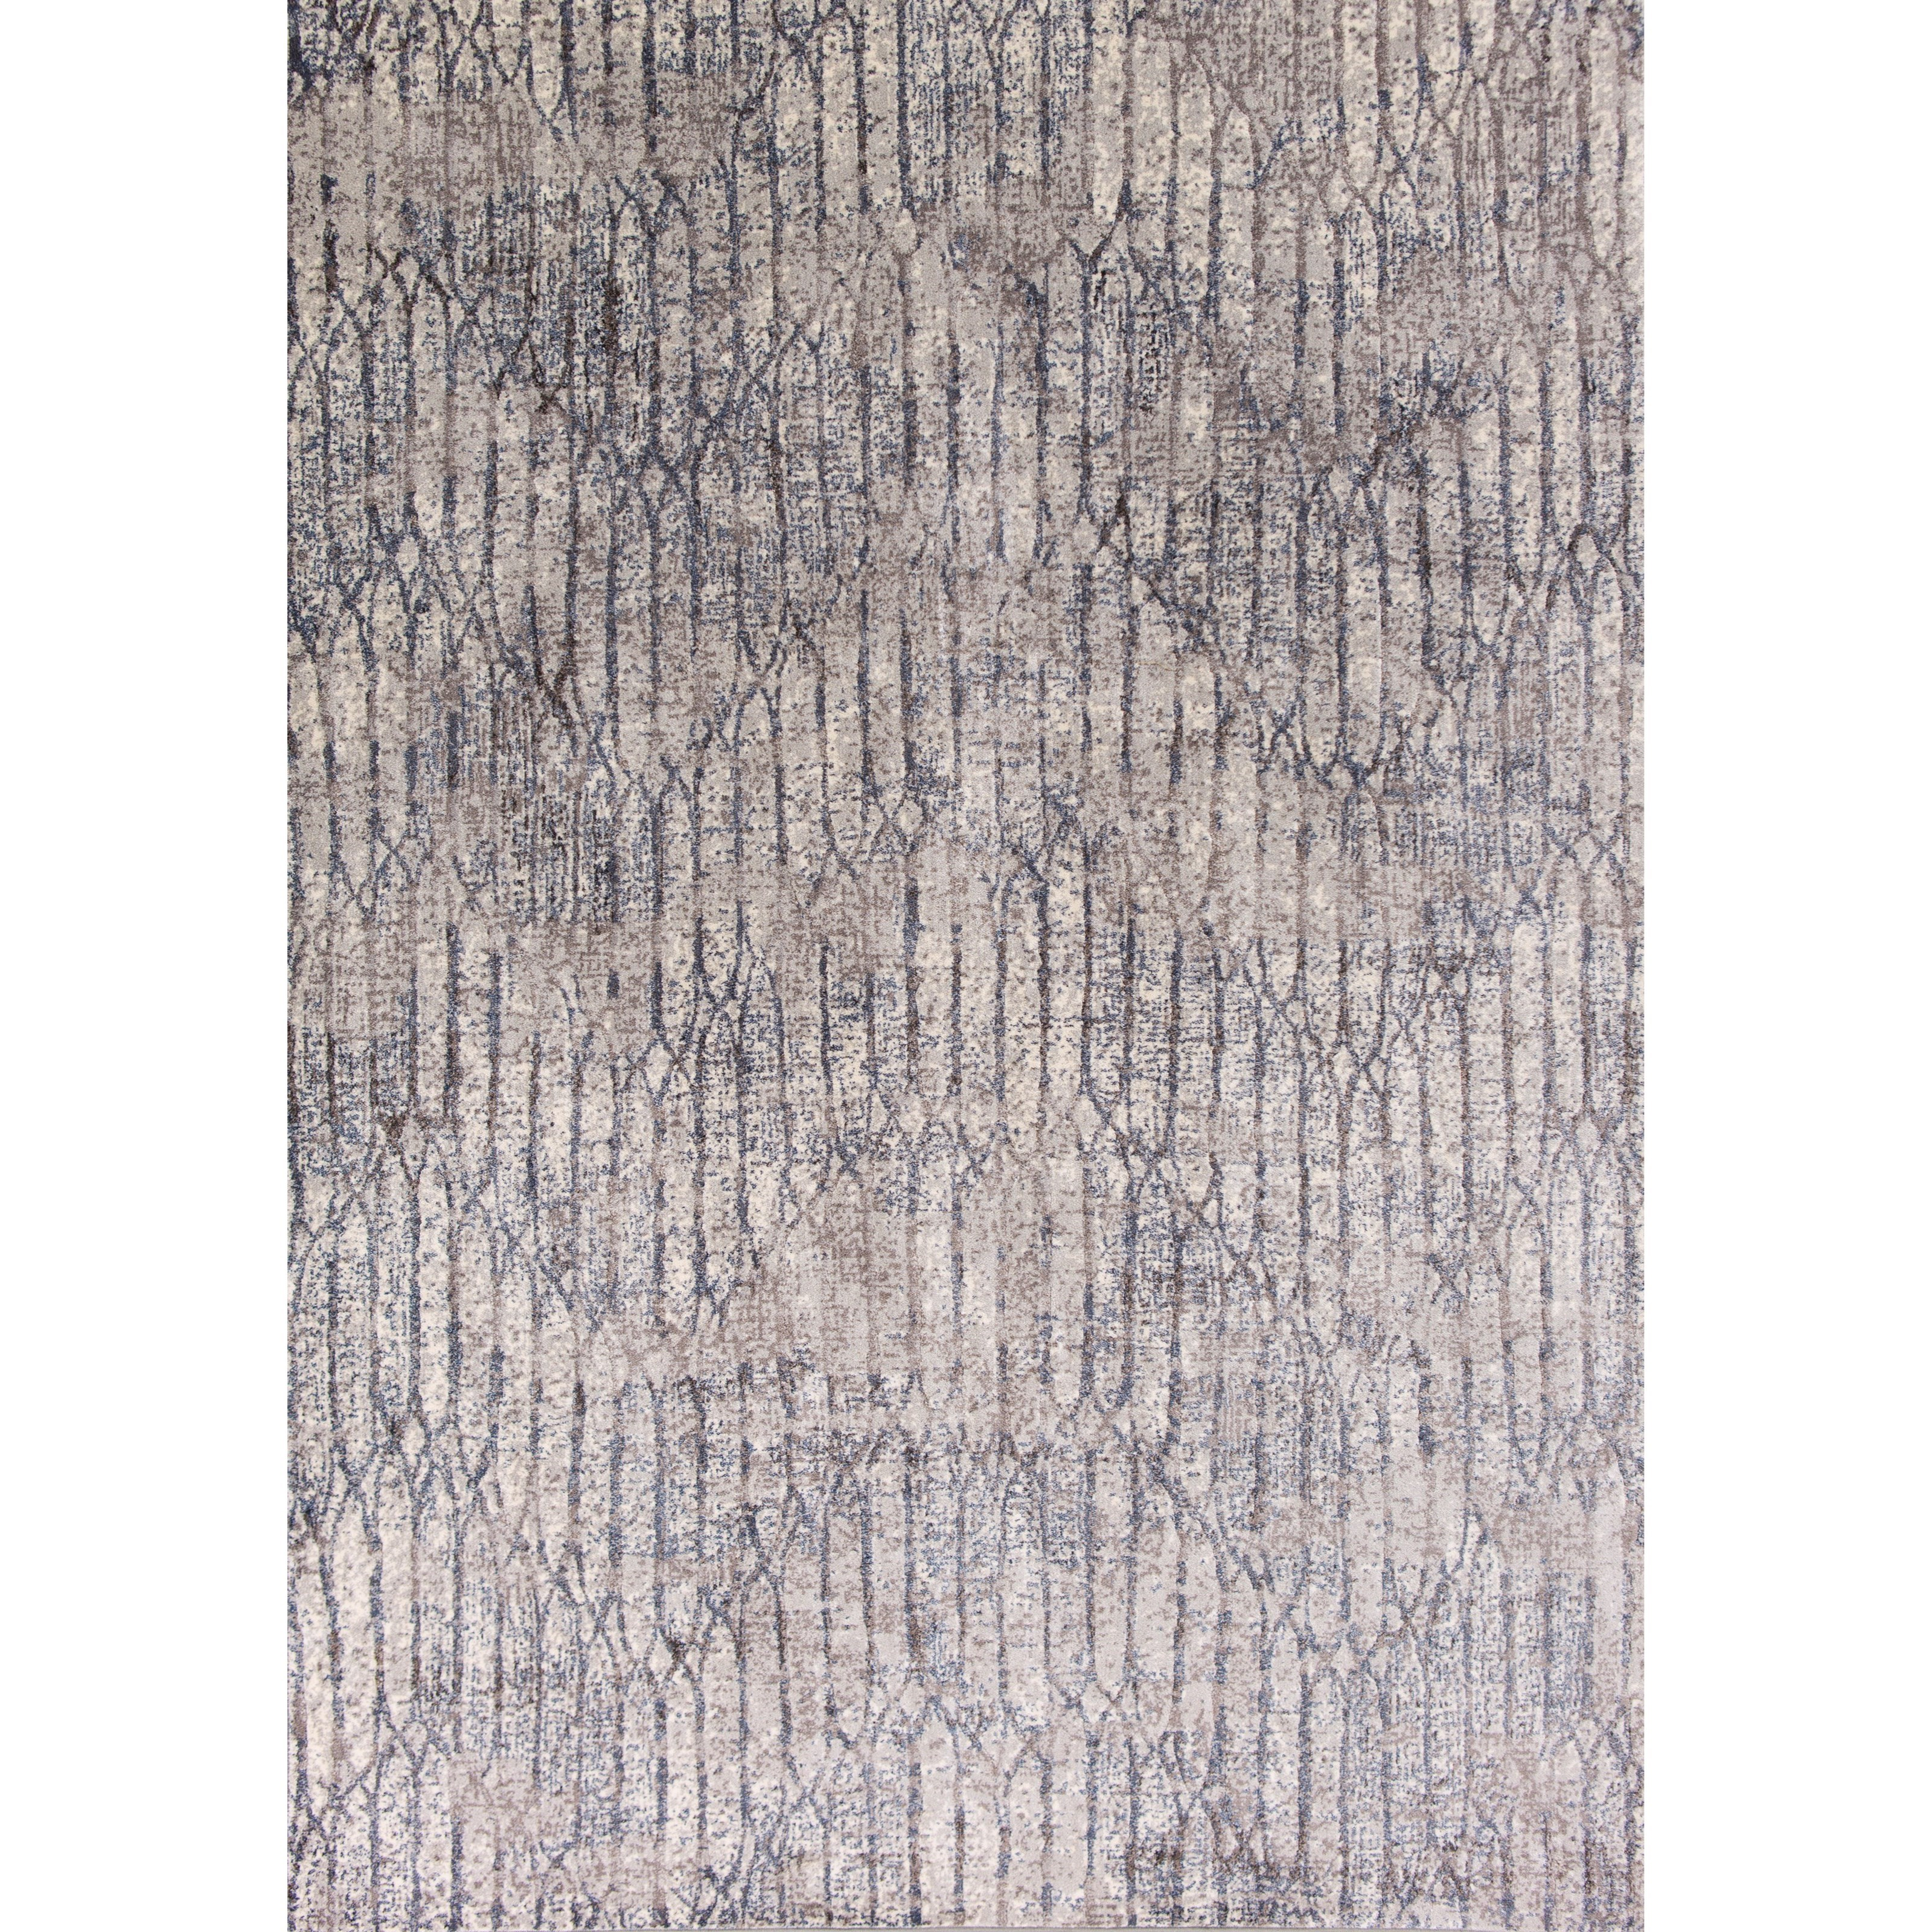 "2'2"" X 6'11"" Grey Blue Illusions Area Rug"